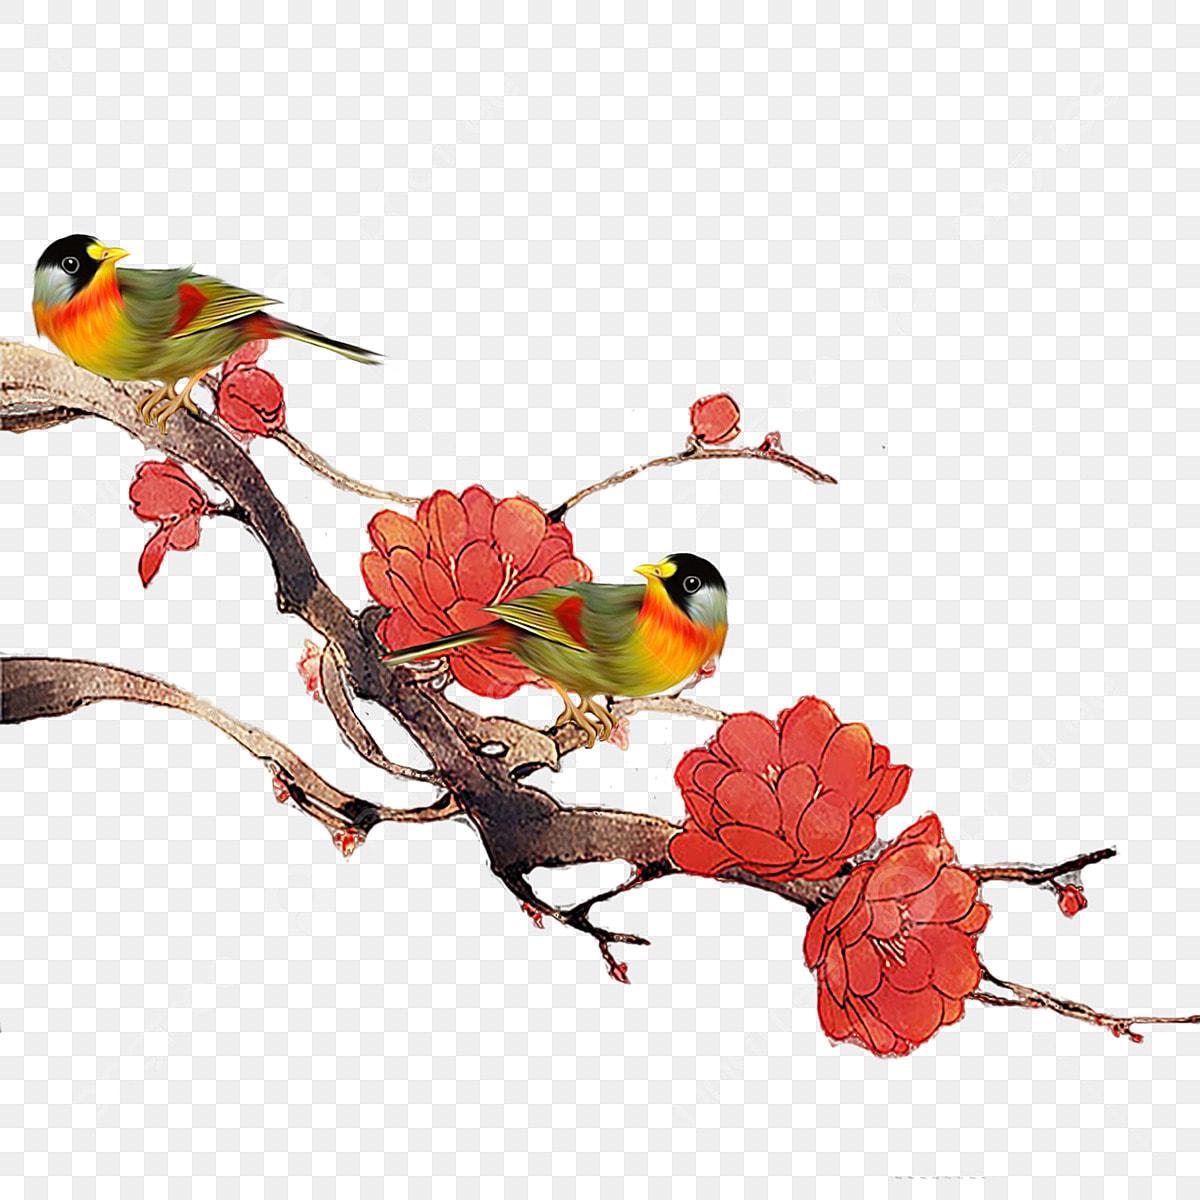 Dessin Anime Oiseau Fleurs Rouges Dessin Anime Oiseau Clipart